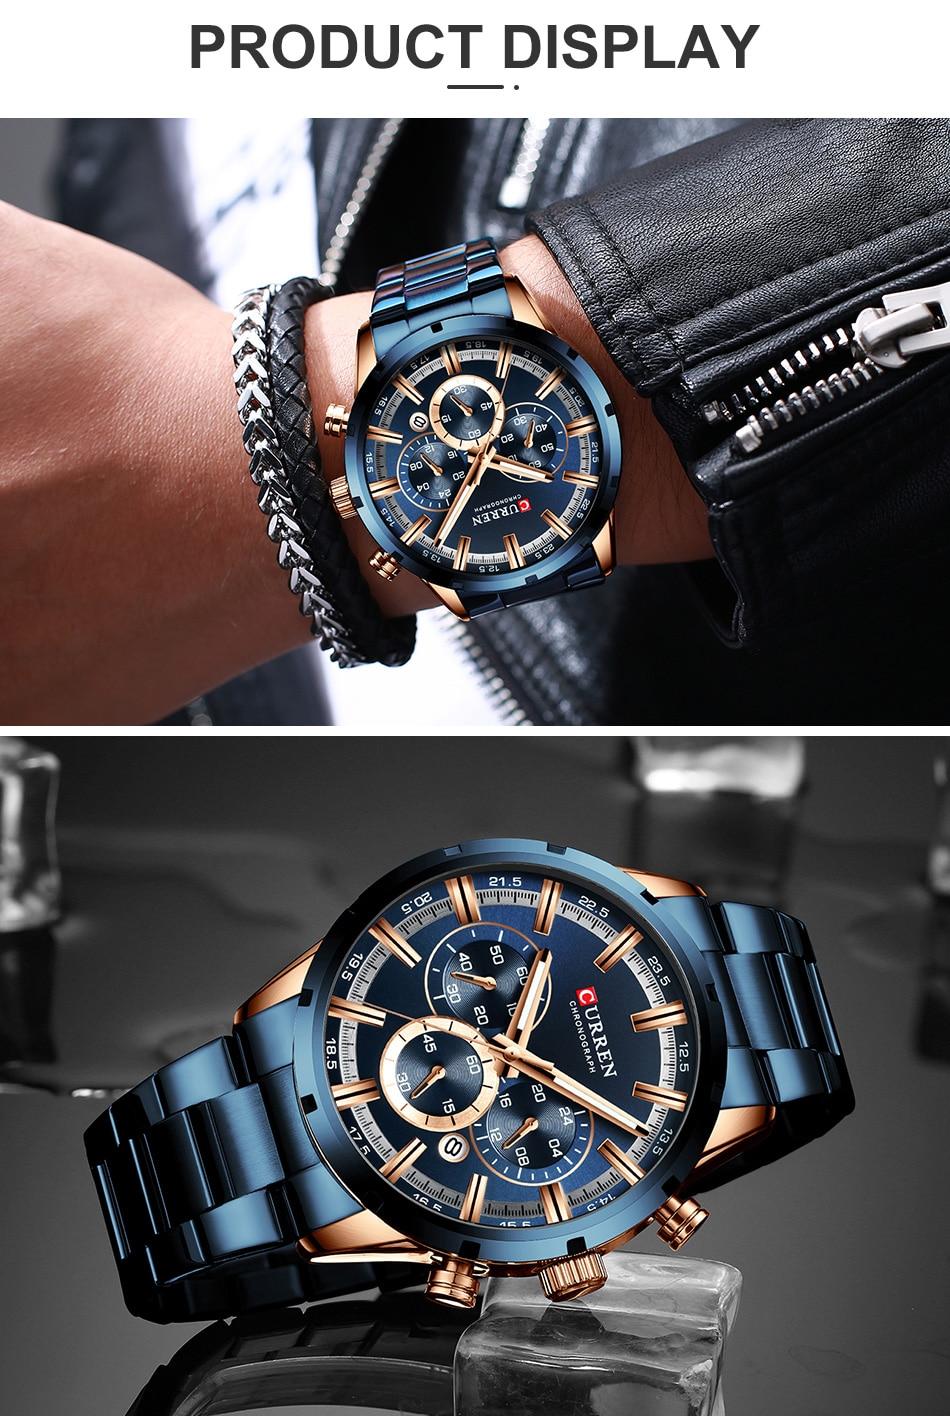 Hf126307175a7426bb4ae4fbe41394e9c8 CURREN Men Watch Top Brand Luxury Sports Quartz Mens Watches Full Steel Waterproof Chronograph Wristwatch Men Relogio Masculino